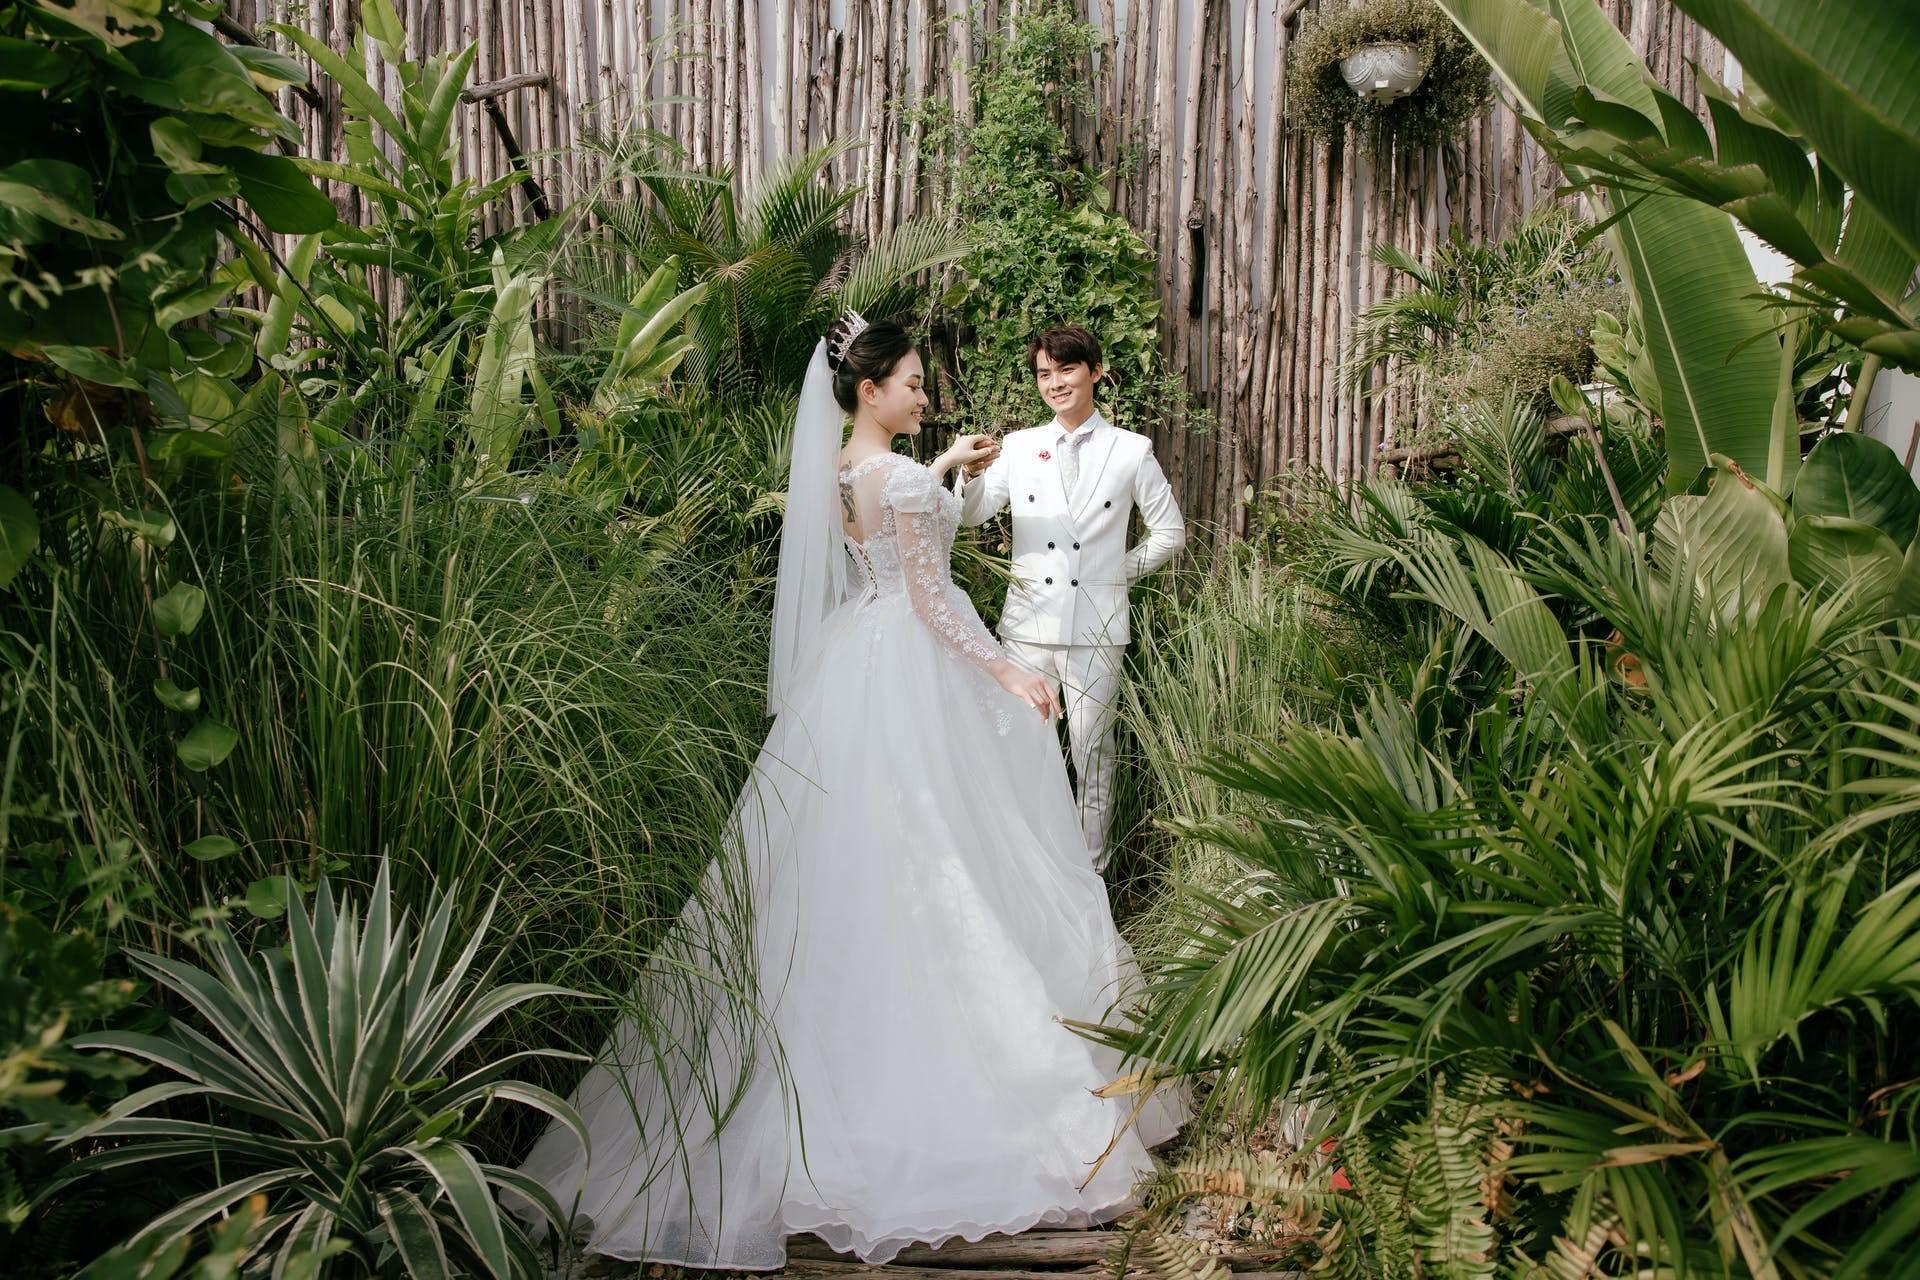 Wedding-Dresses-3510